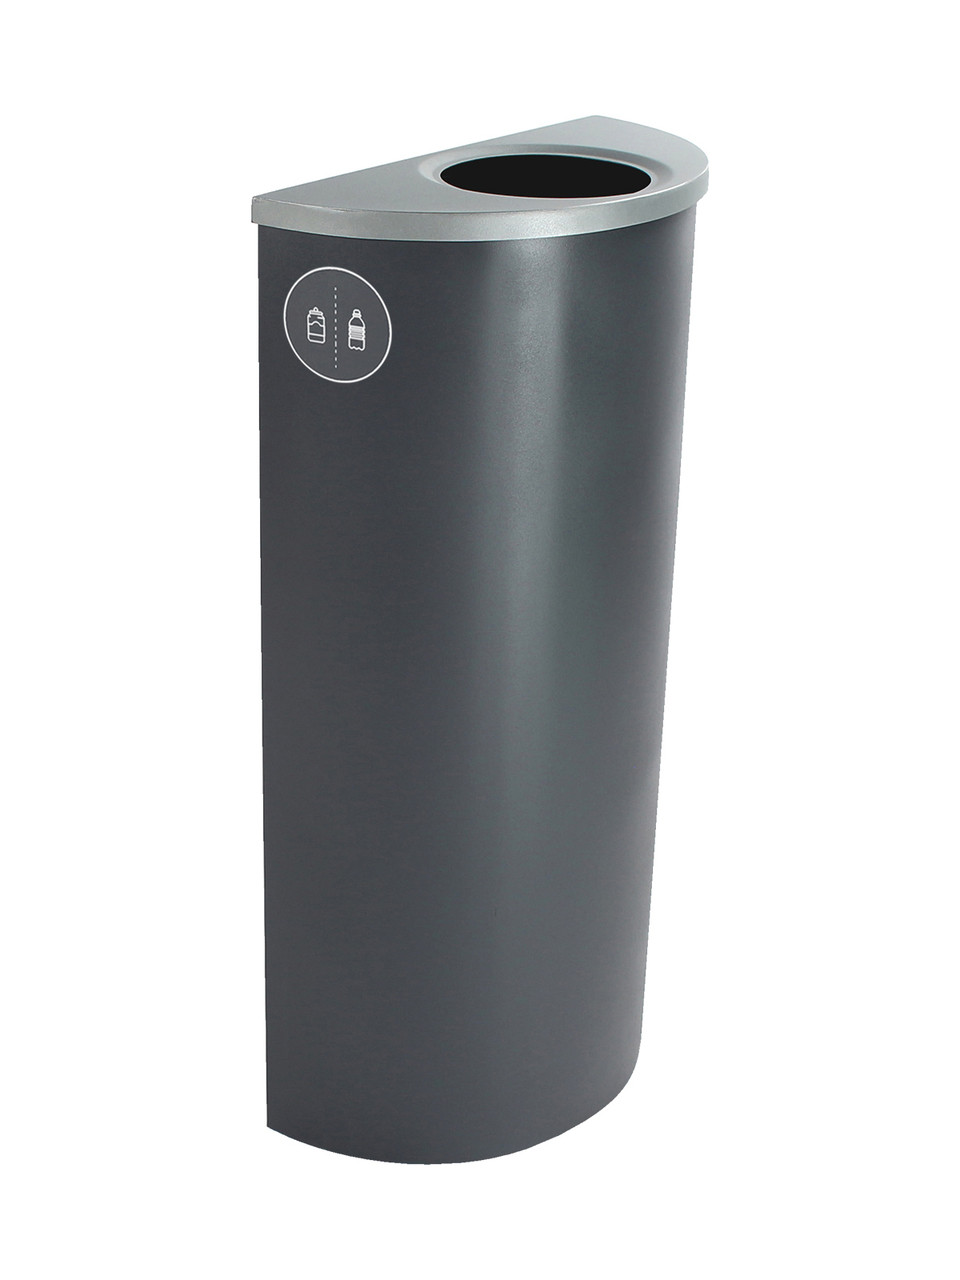 8 Gallon Steel Spectrum Half Round Bottles & Cans Collector Gray 8107020-1